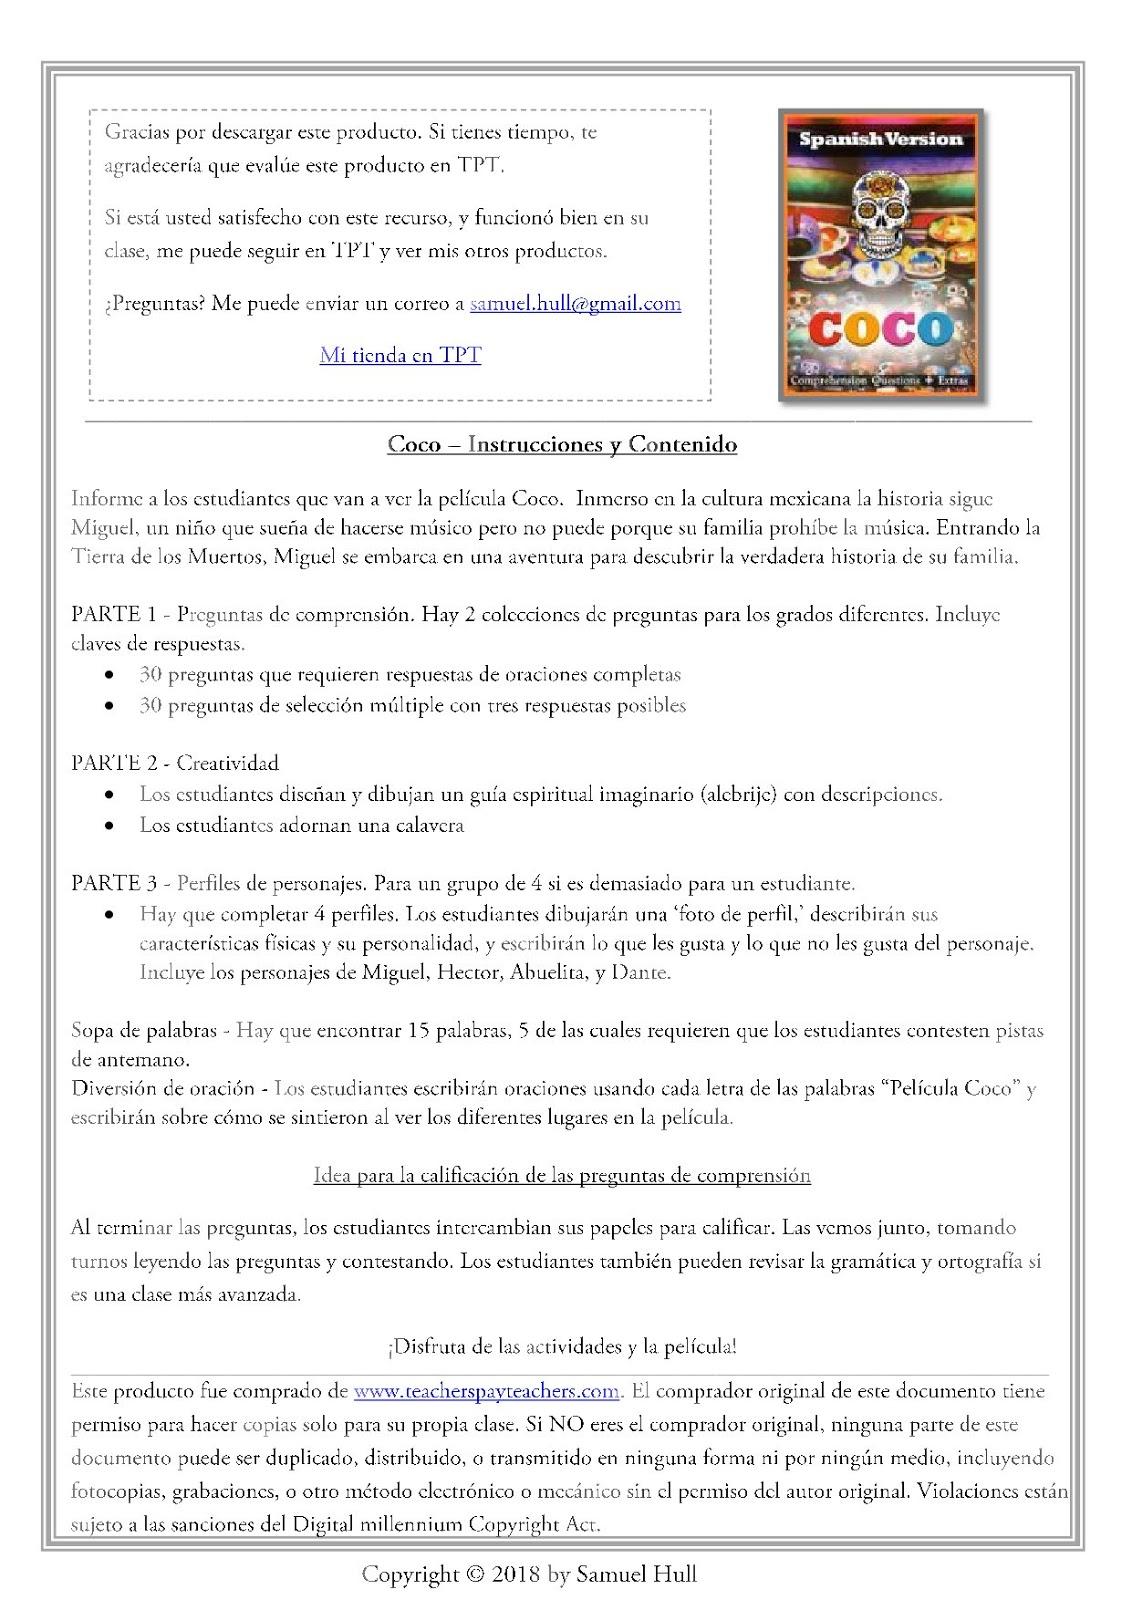 Coco Movie Guide In Spanish En Espanol Activities Answer Key